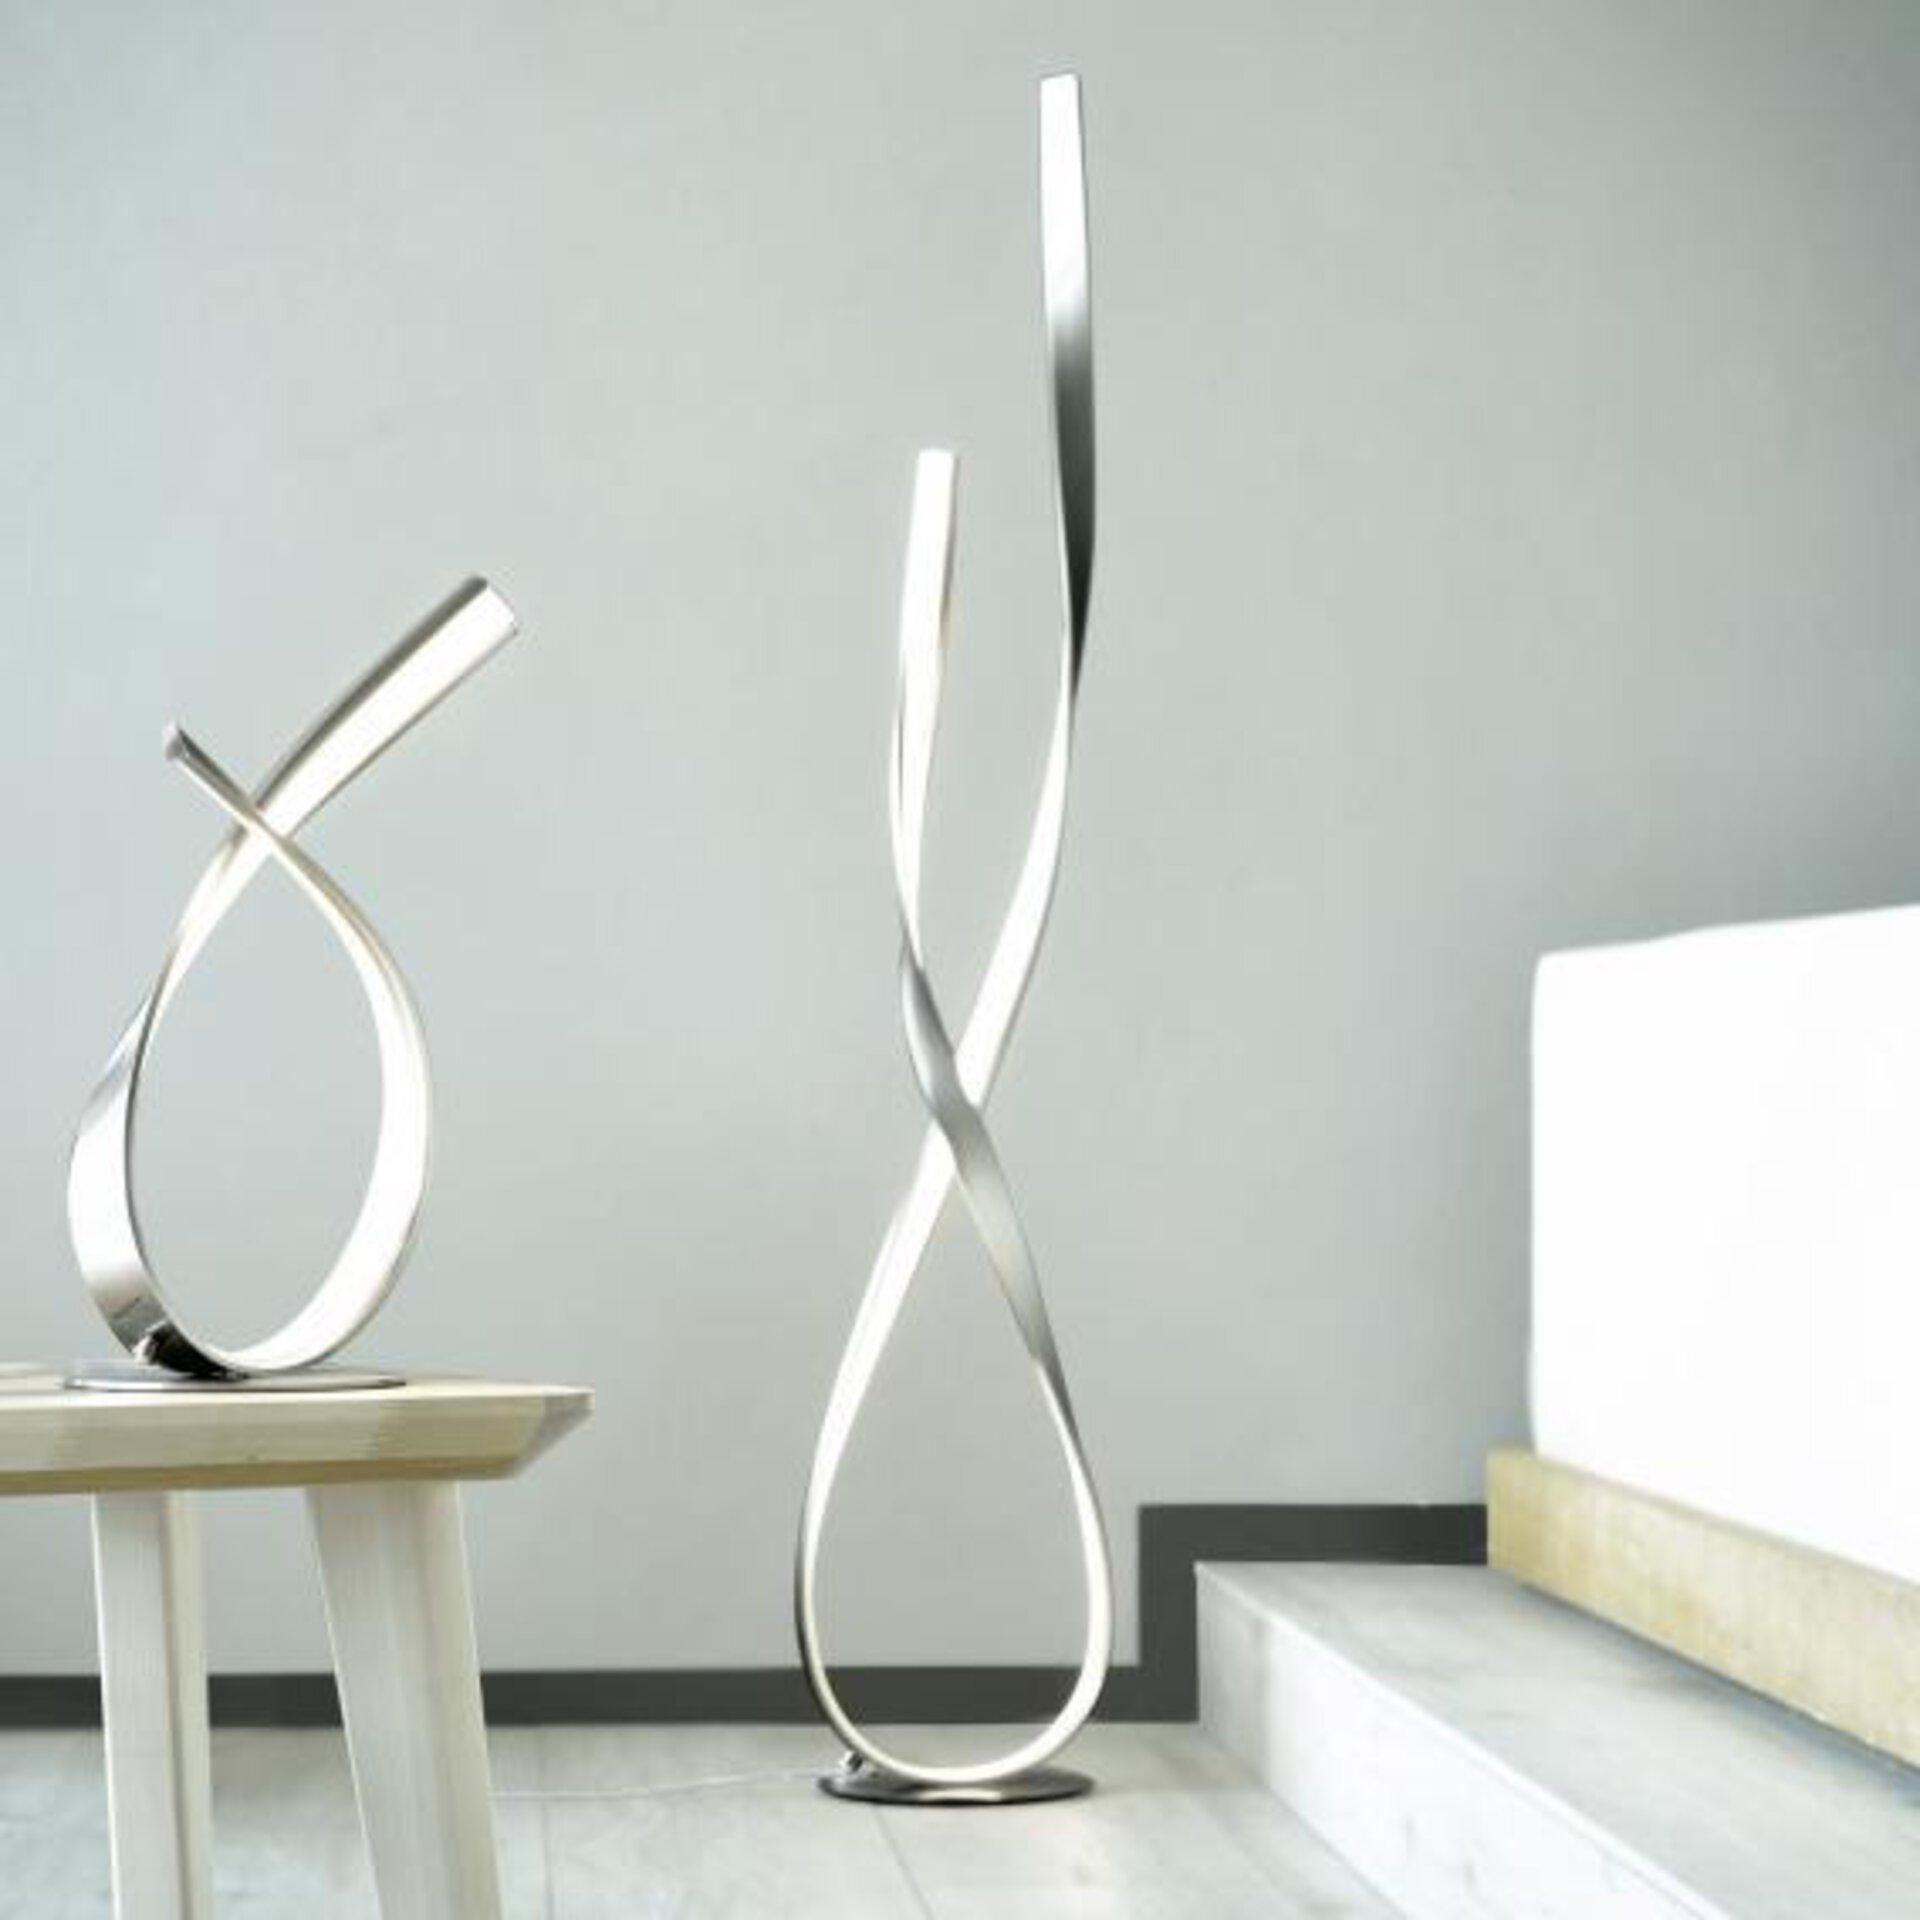 Stehleuchte LINDA Paul Neuhaus Metall silber 23 x 140 x 23 cm